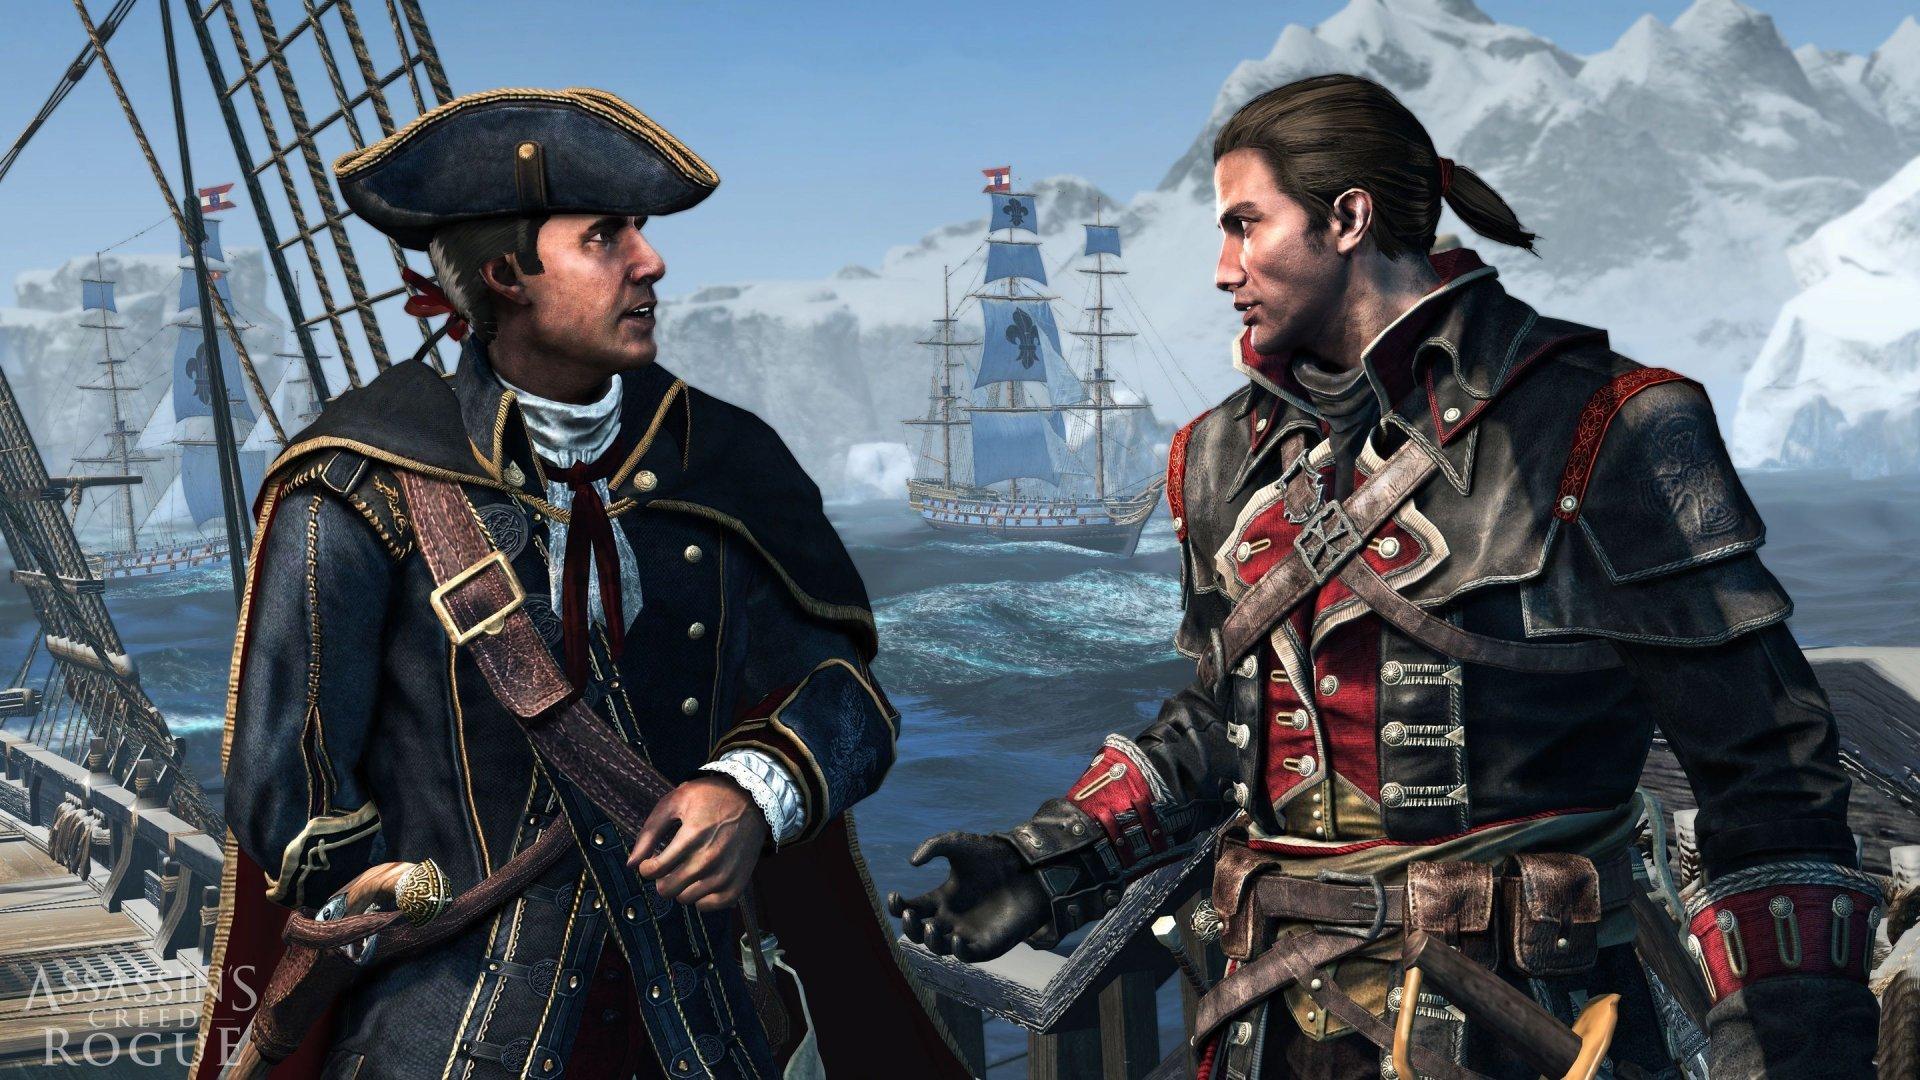 Free Download Assassin S Creed Rogue Wallpaper Id 231481 Full Hd